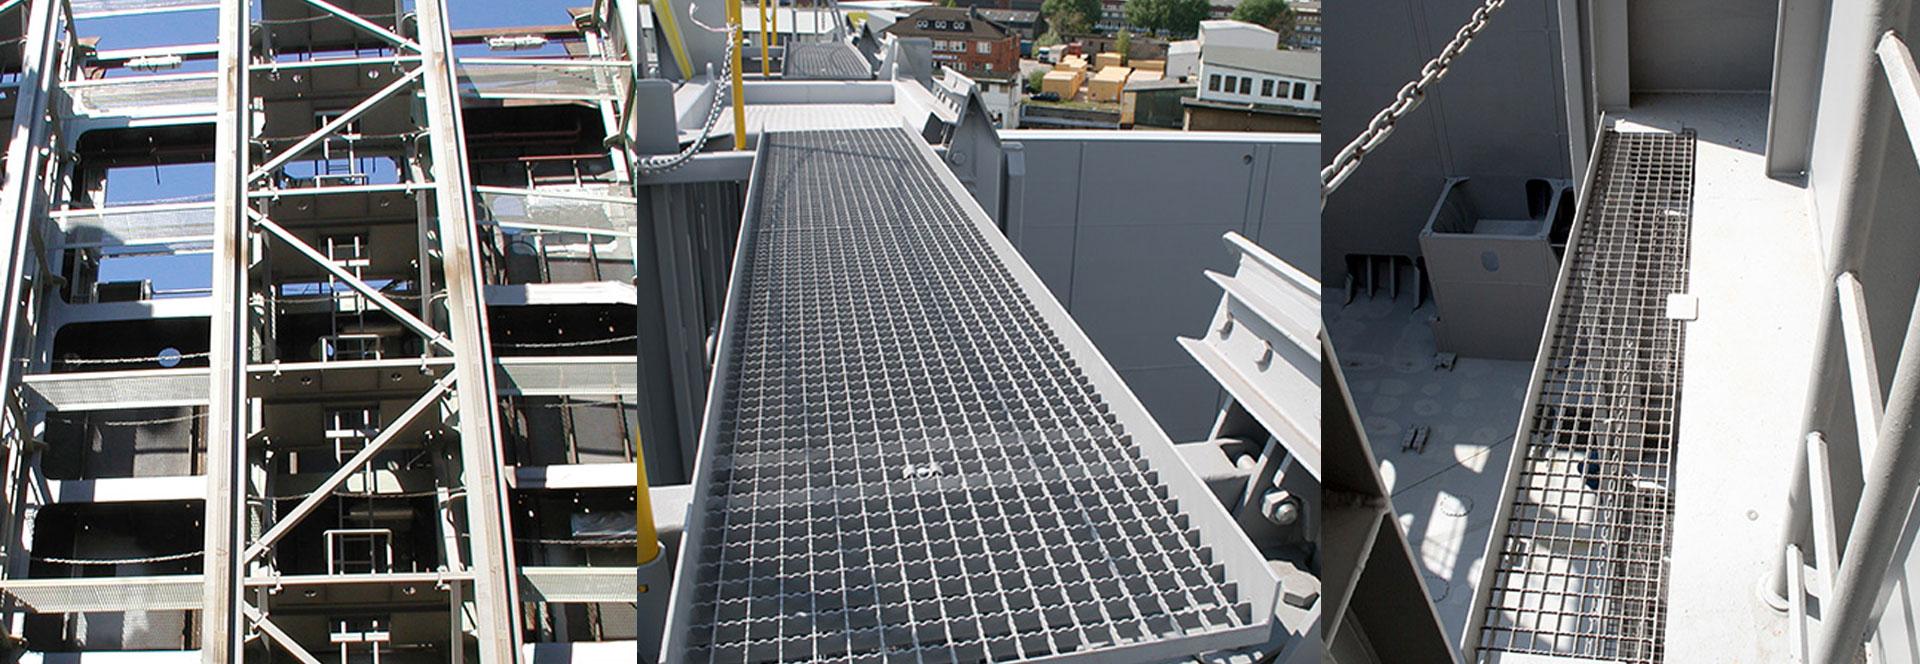 MEA Metal Applications - Referenzen Sietas Werft Hamburg